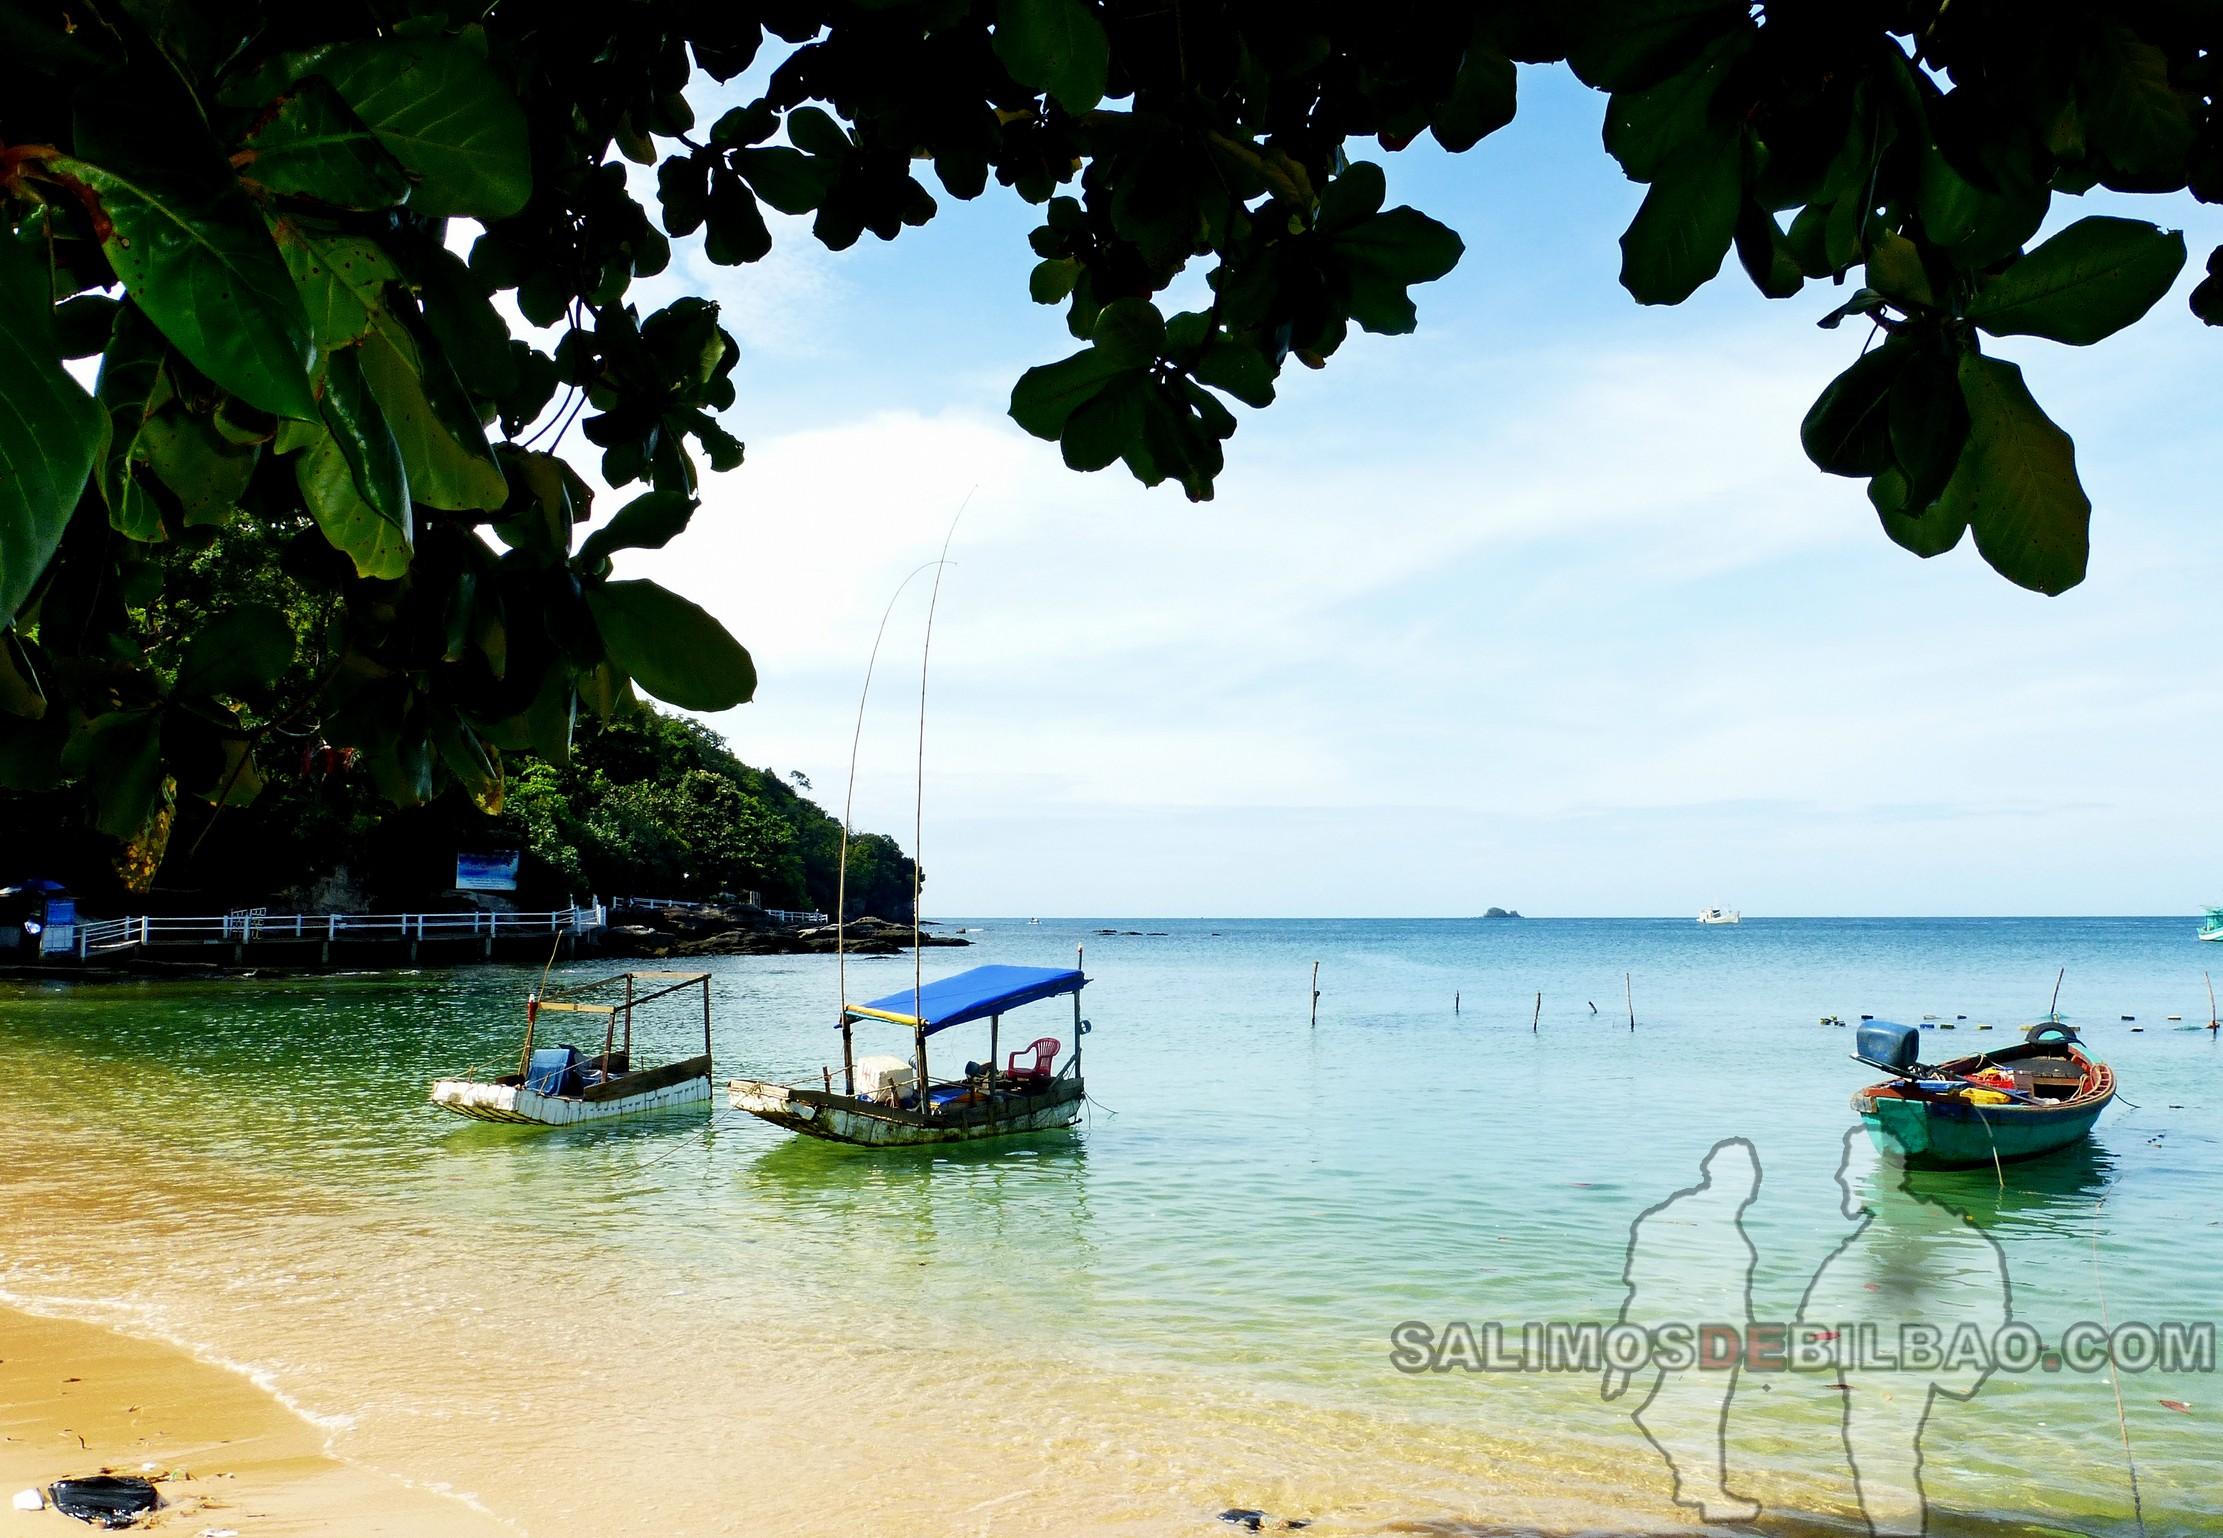 0148. Playa de Bai bien Ganh Dau, Noreste de Phu Quoc